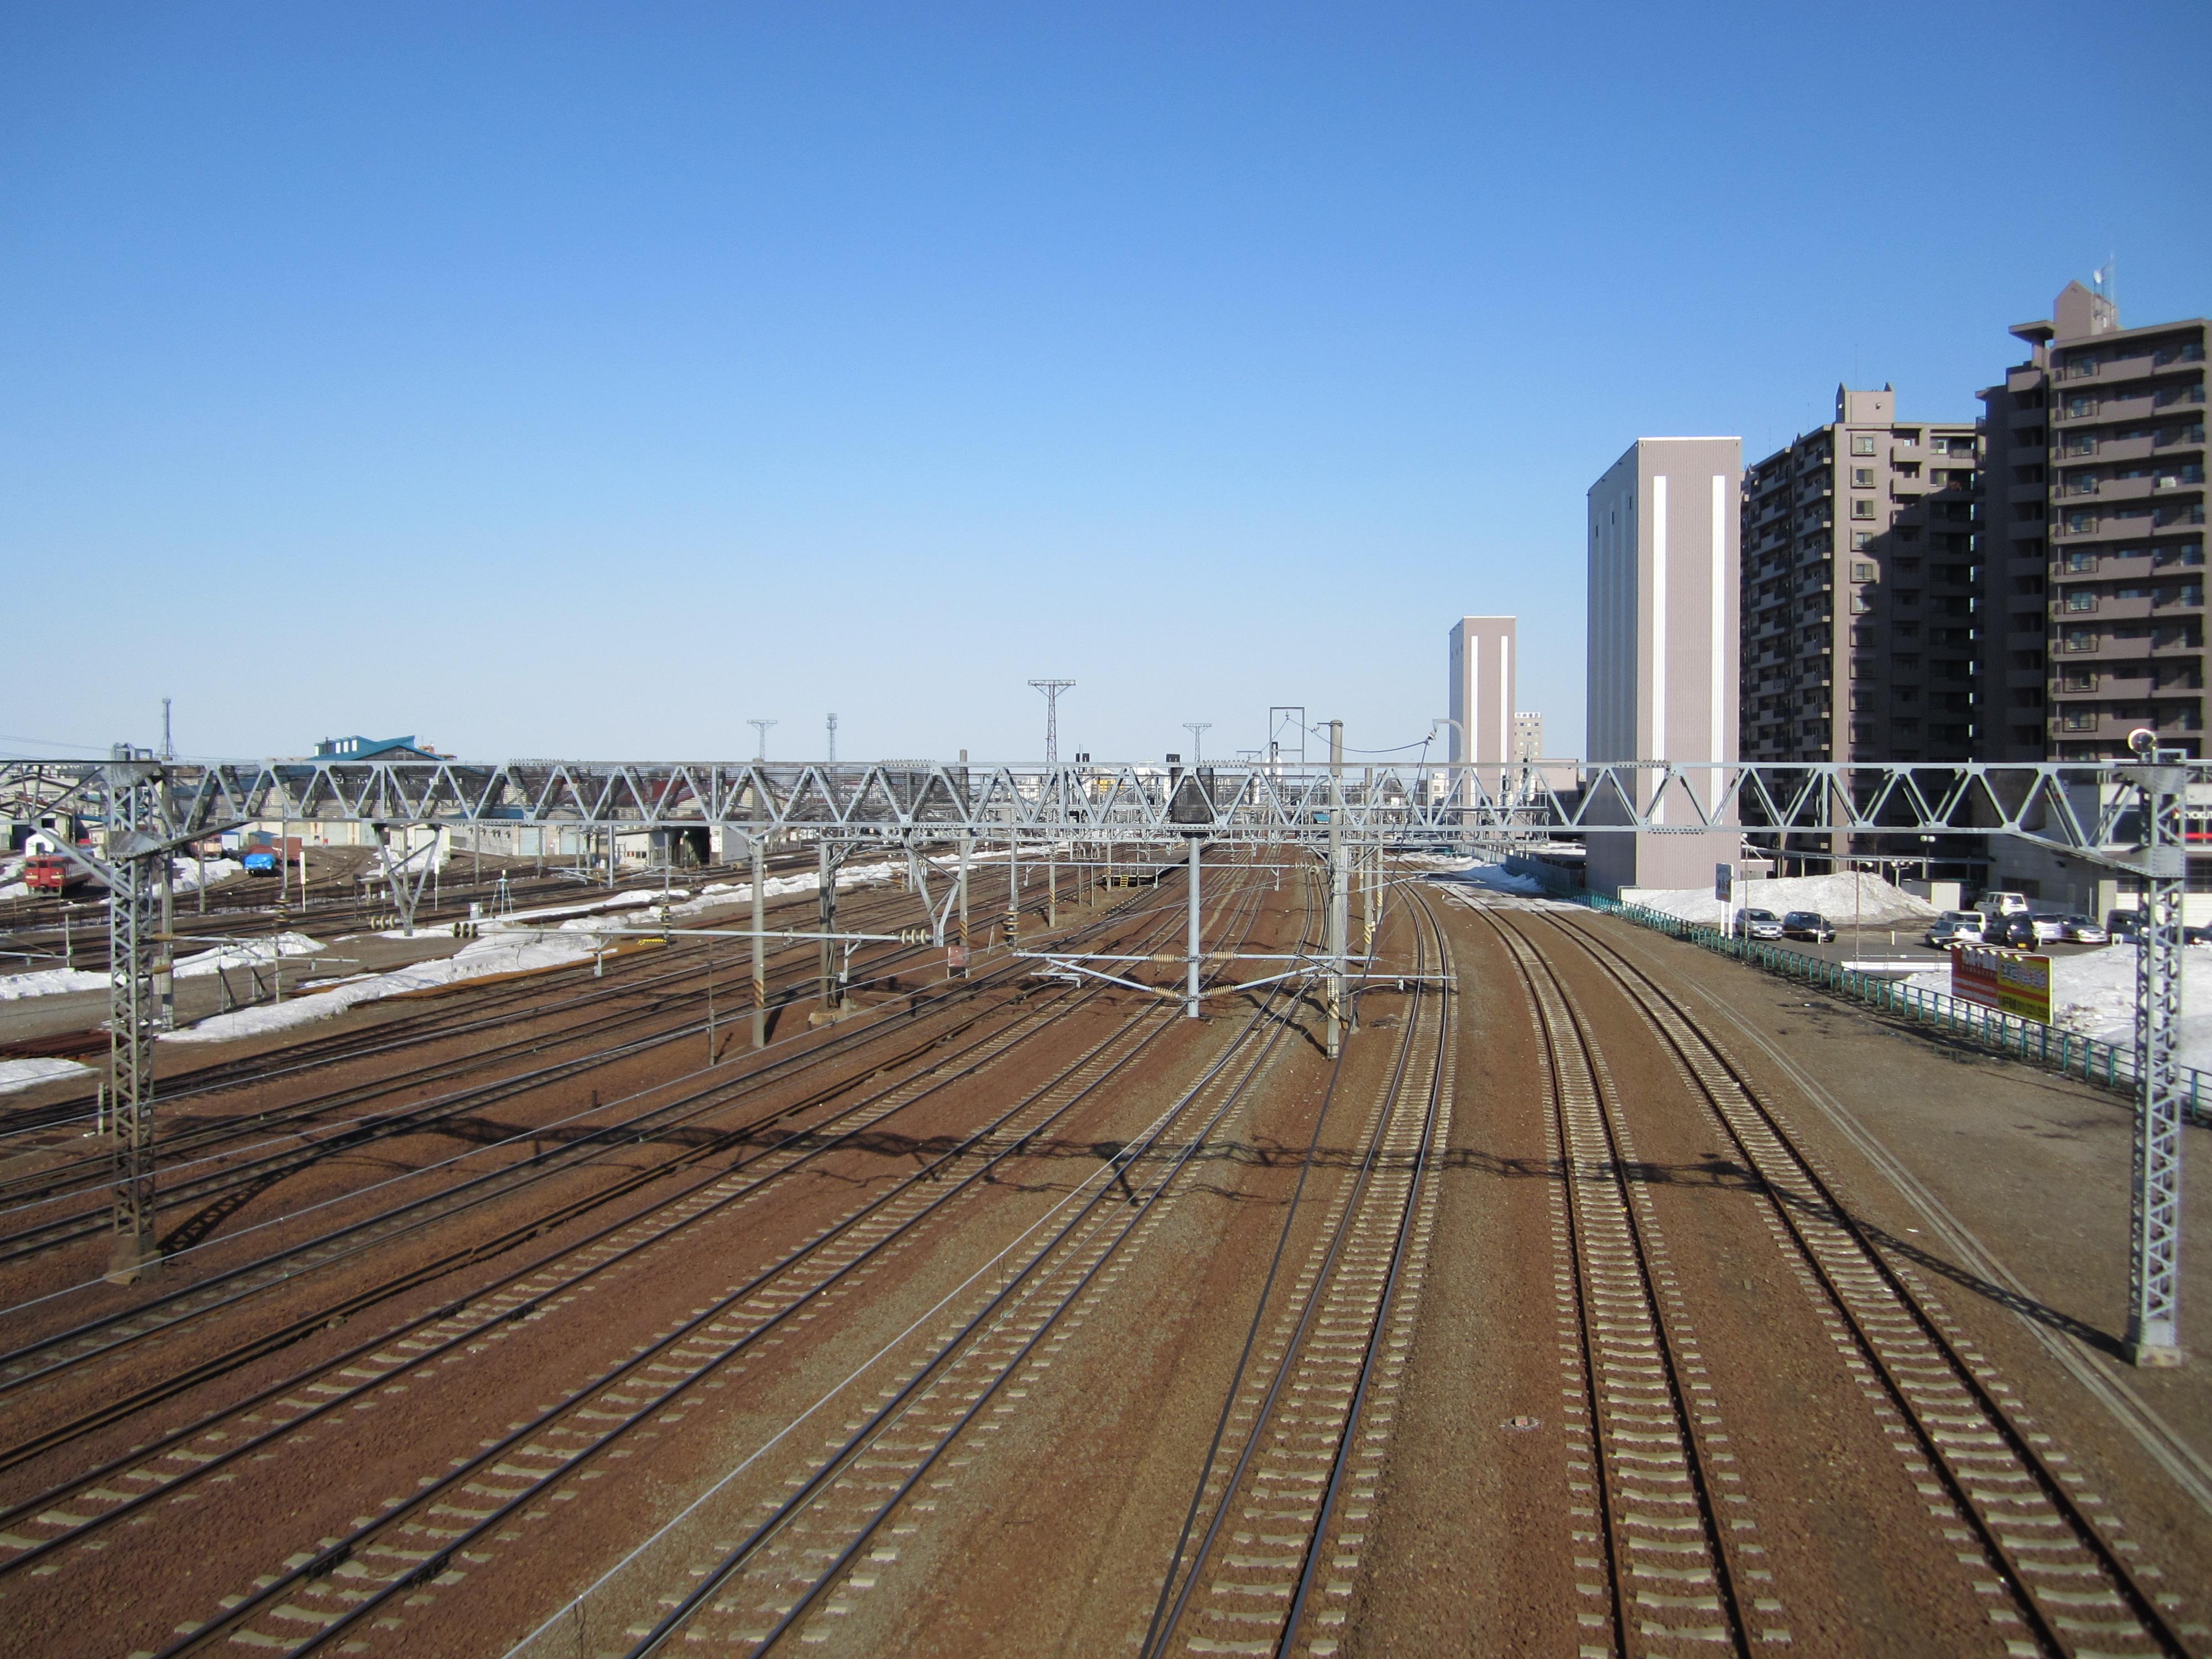 https://upload.wikimedia.org/wikipedia/commons/9/9b/Naebo_sta_railway.JPG